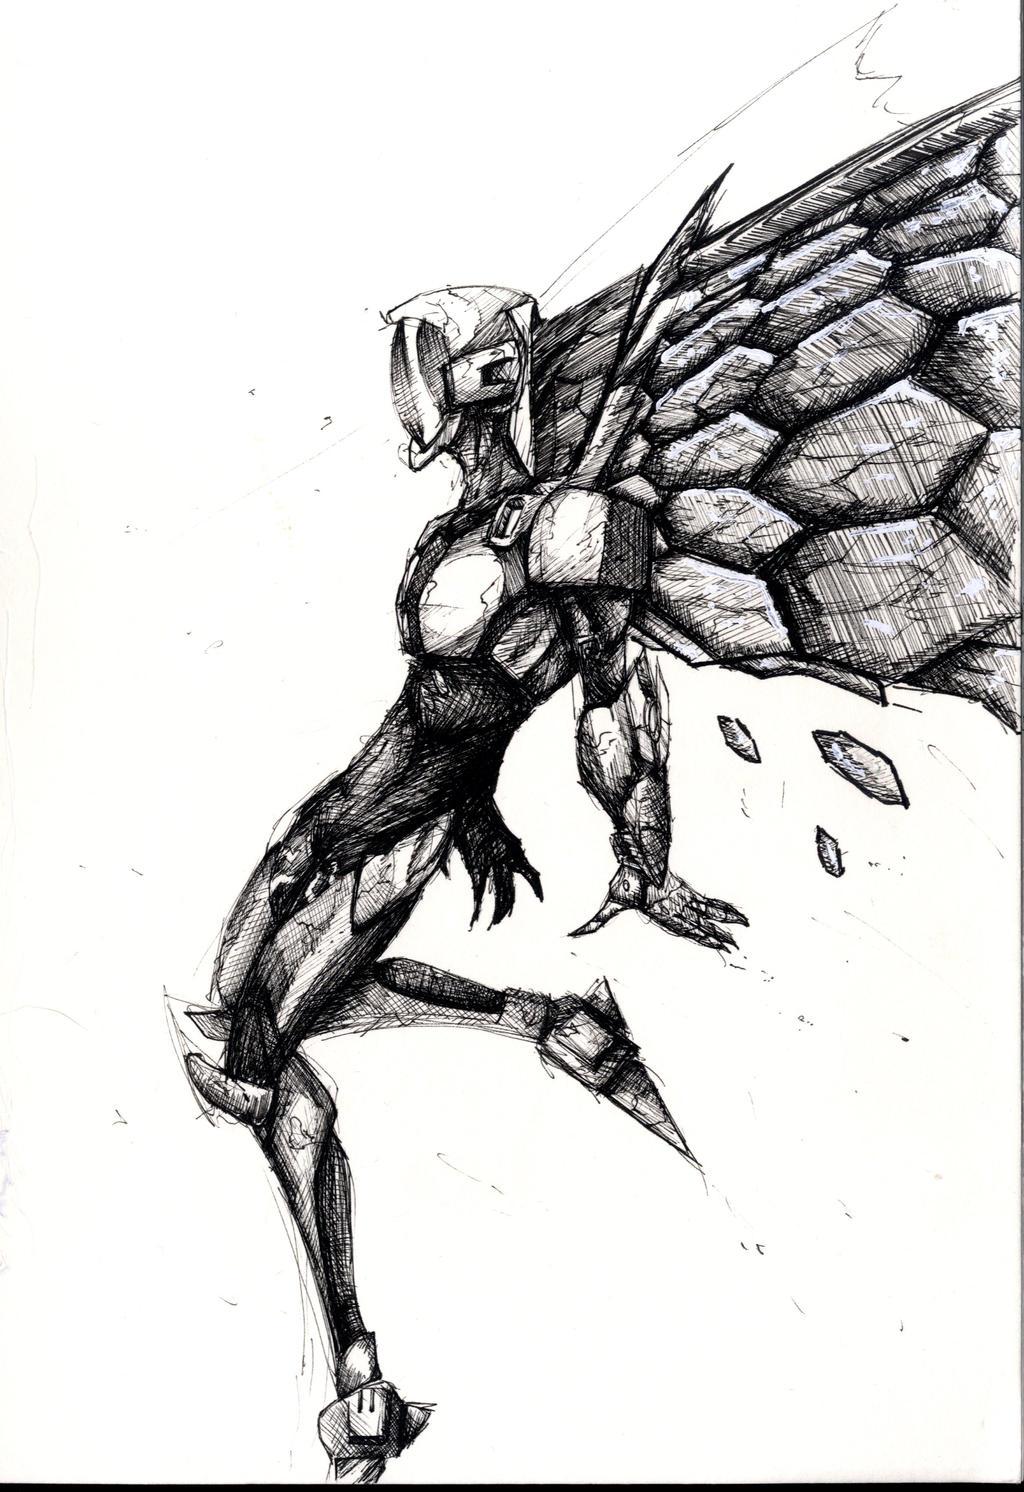 Accel World Silver Crow By LyricaBelachium